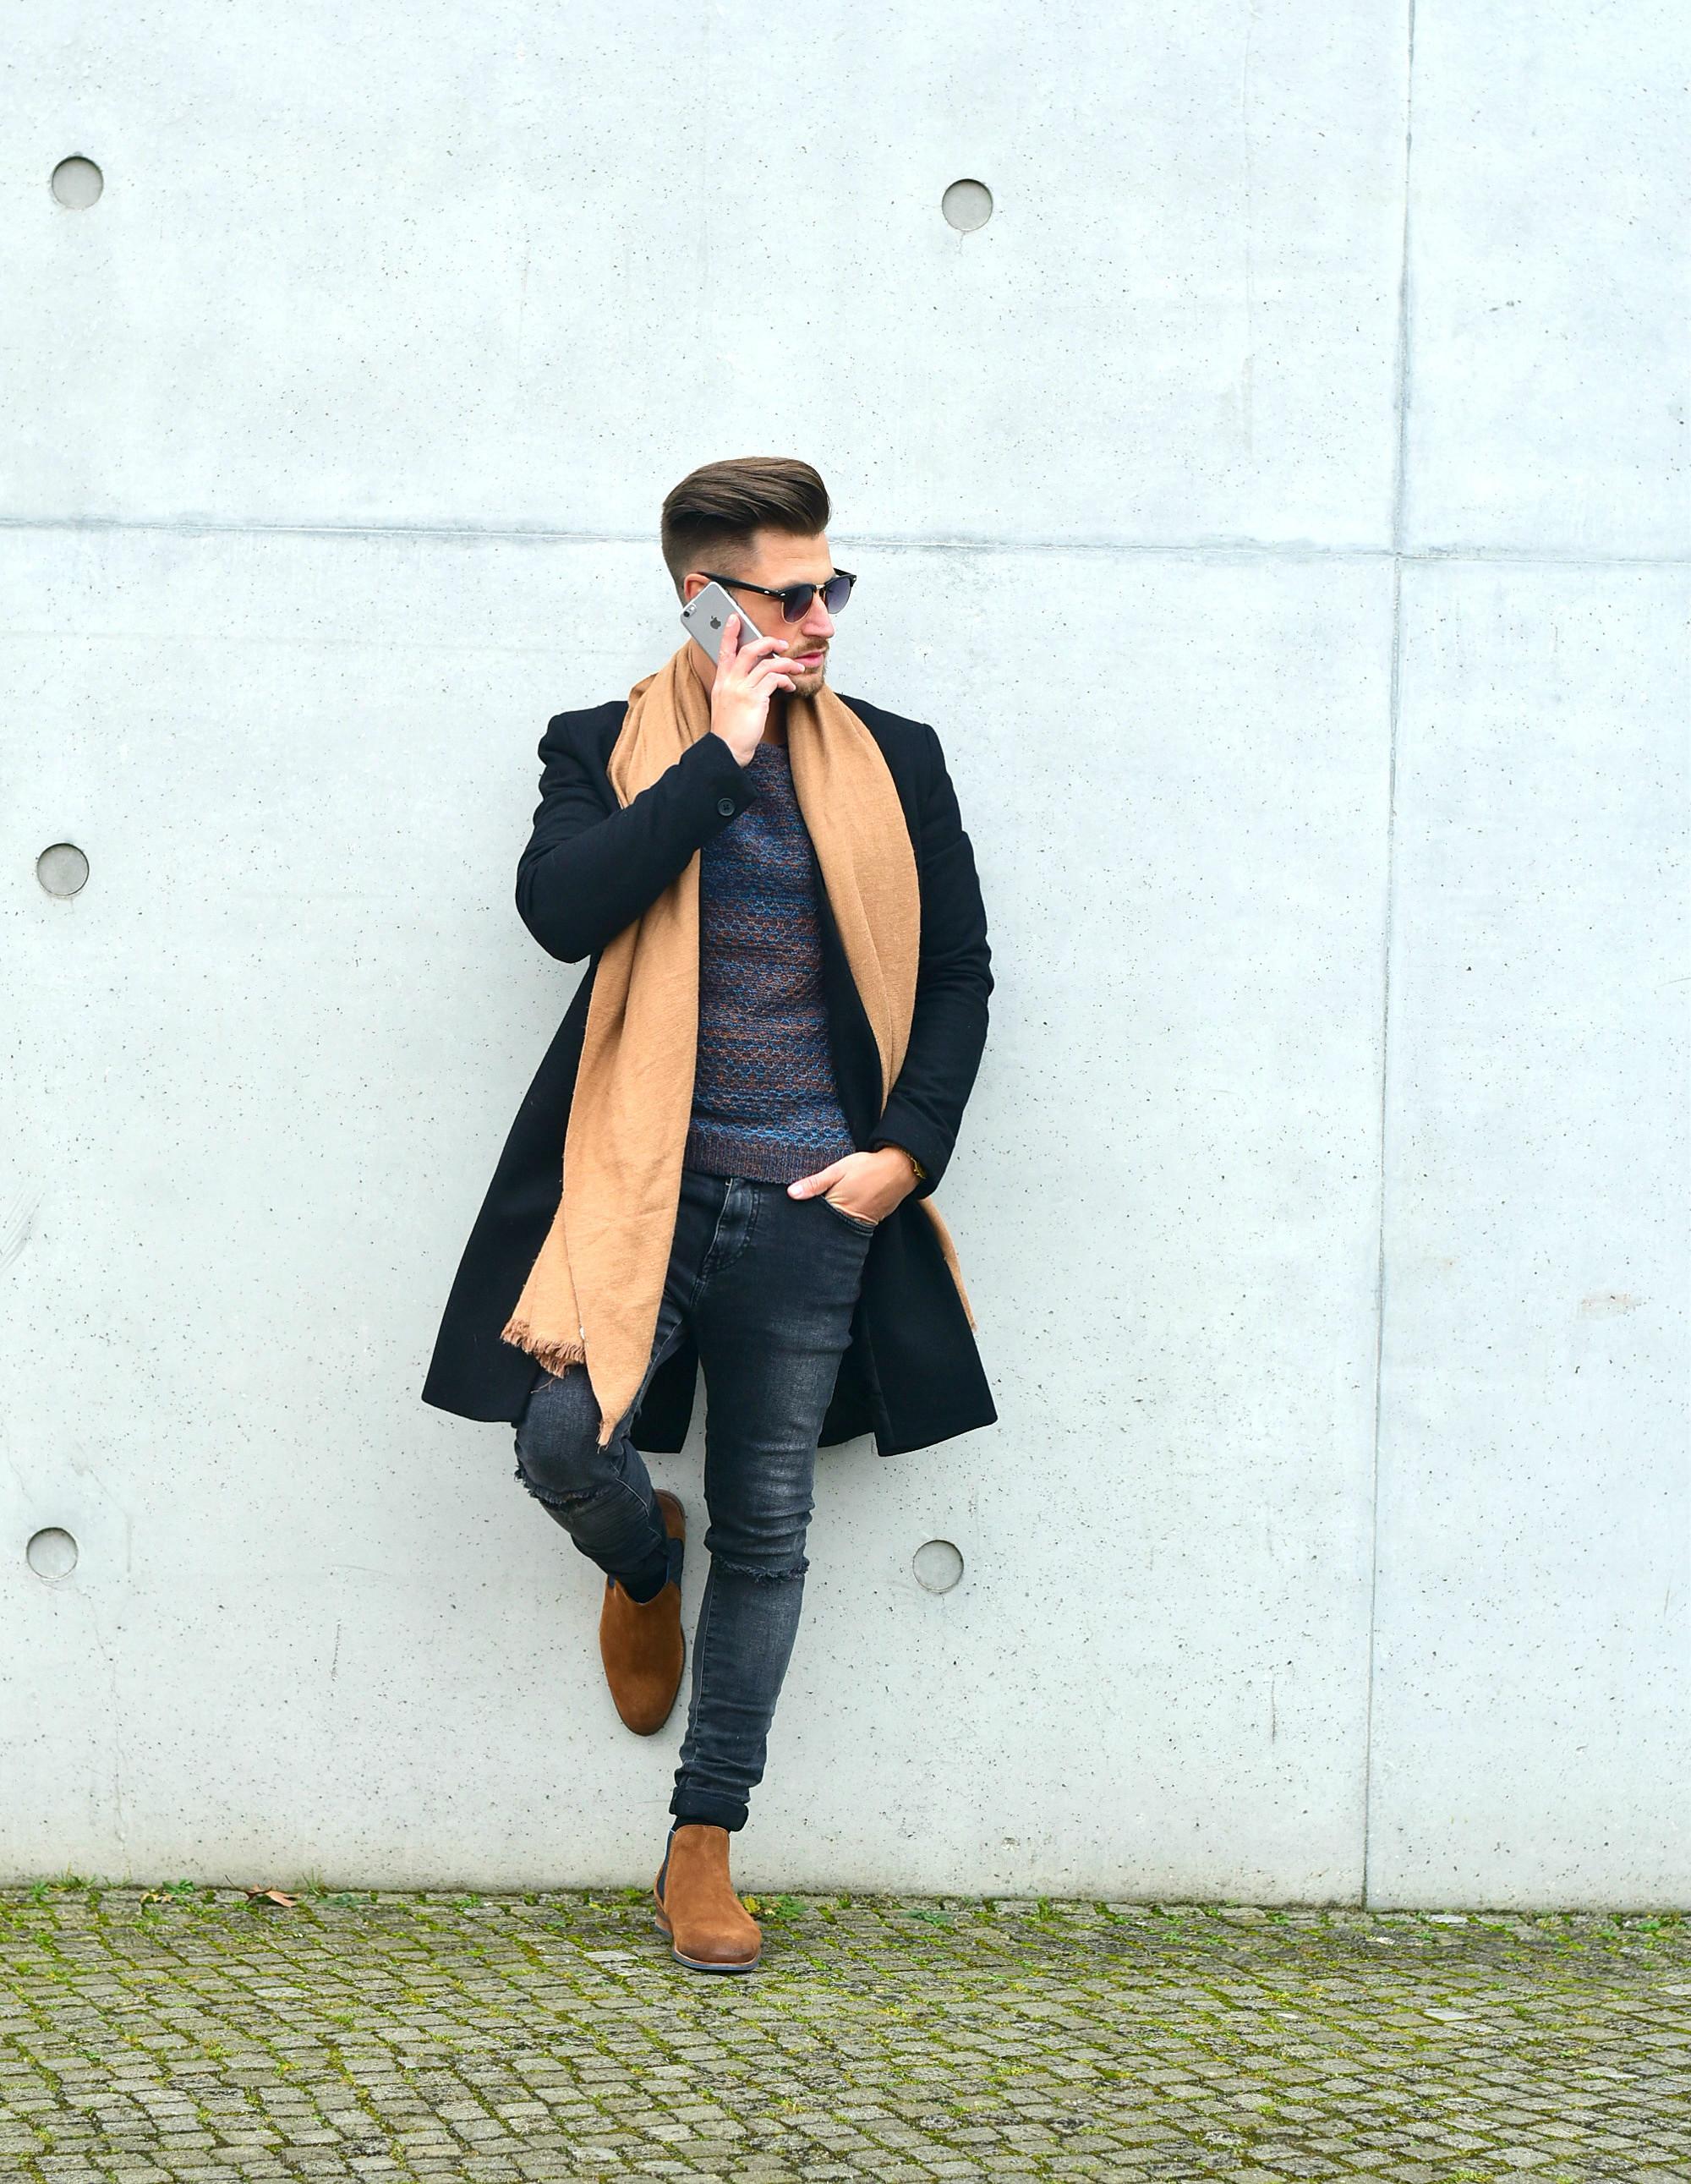 Styleblog-Männerblog-Modeblog-Berlin-Mantel-Coat-Chelseaboots-Smart-Look-Männermode-Streetwear